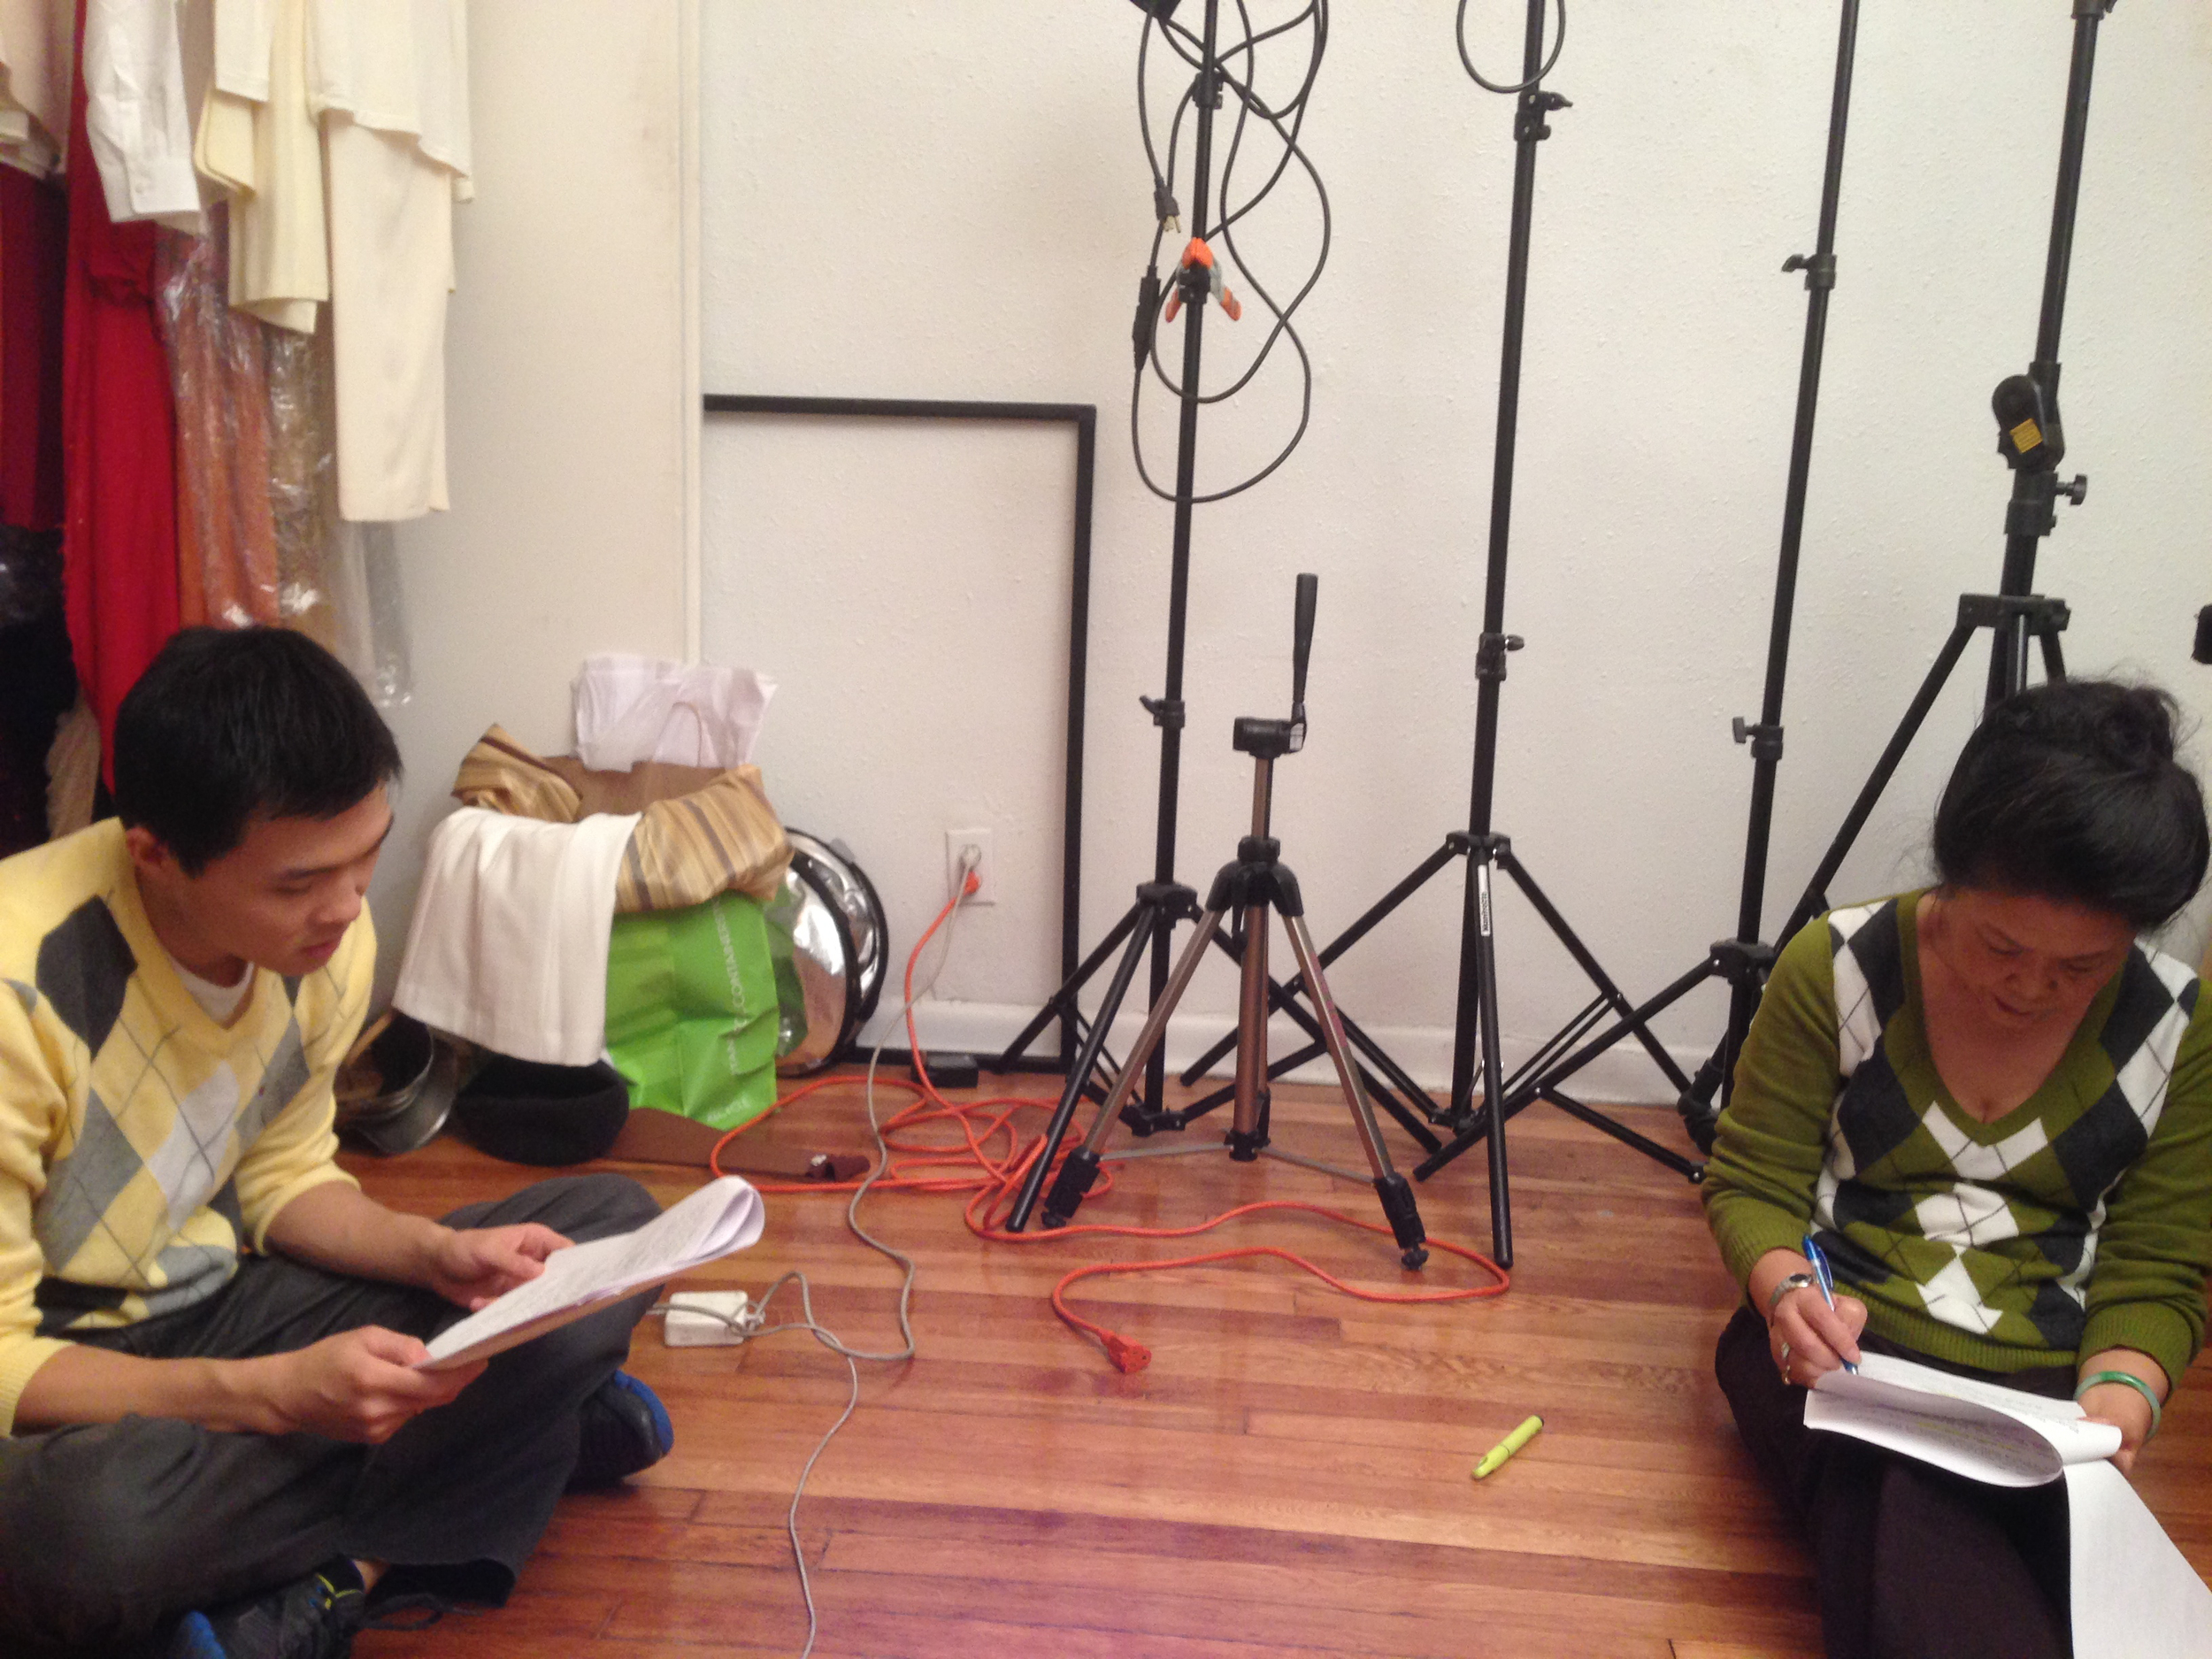 Actors Zilong Zee and Minwen Huang during a read through.